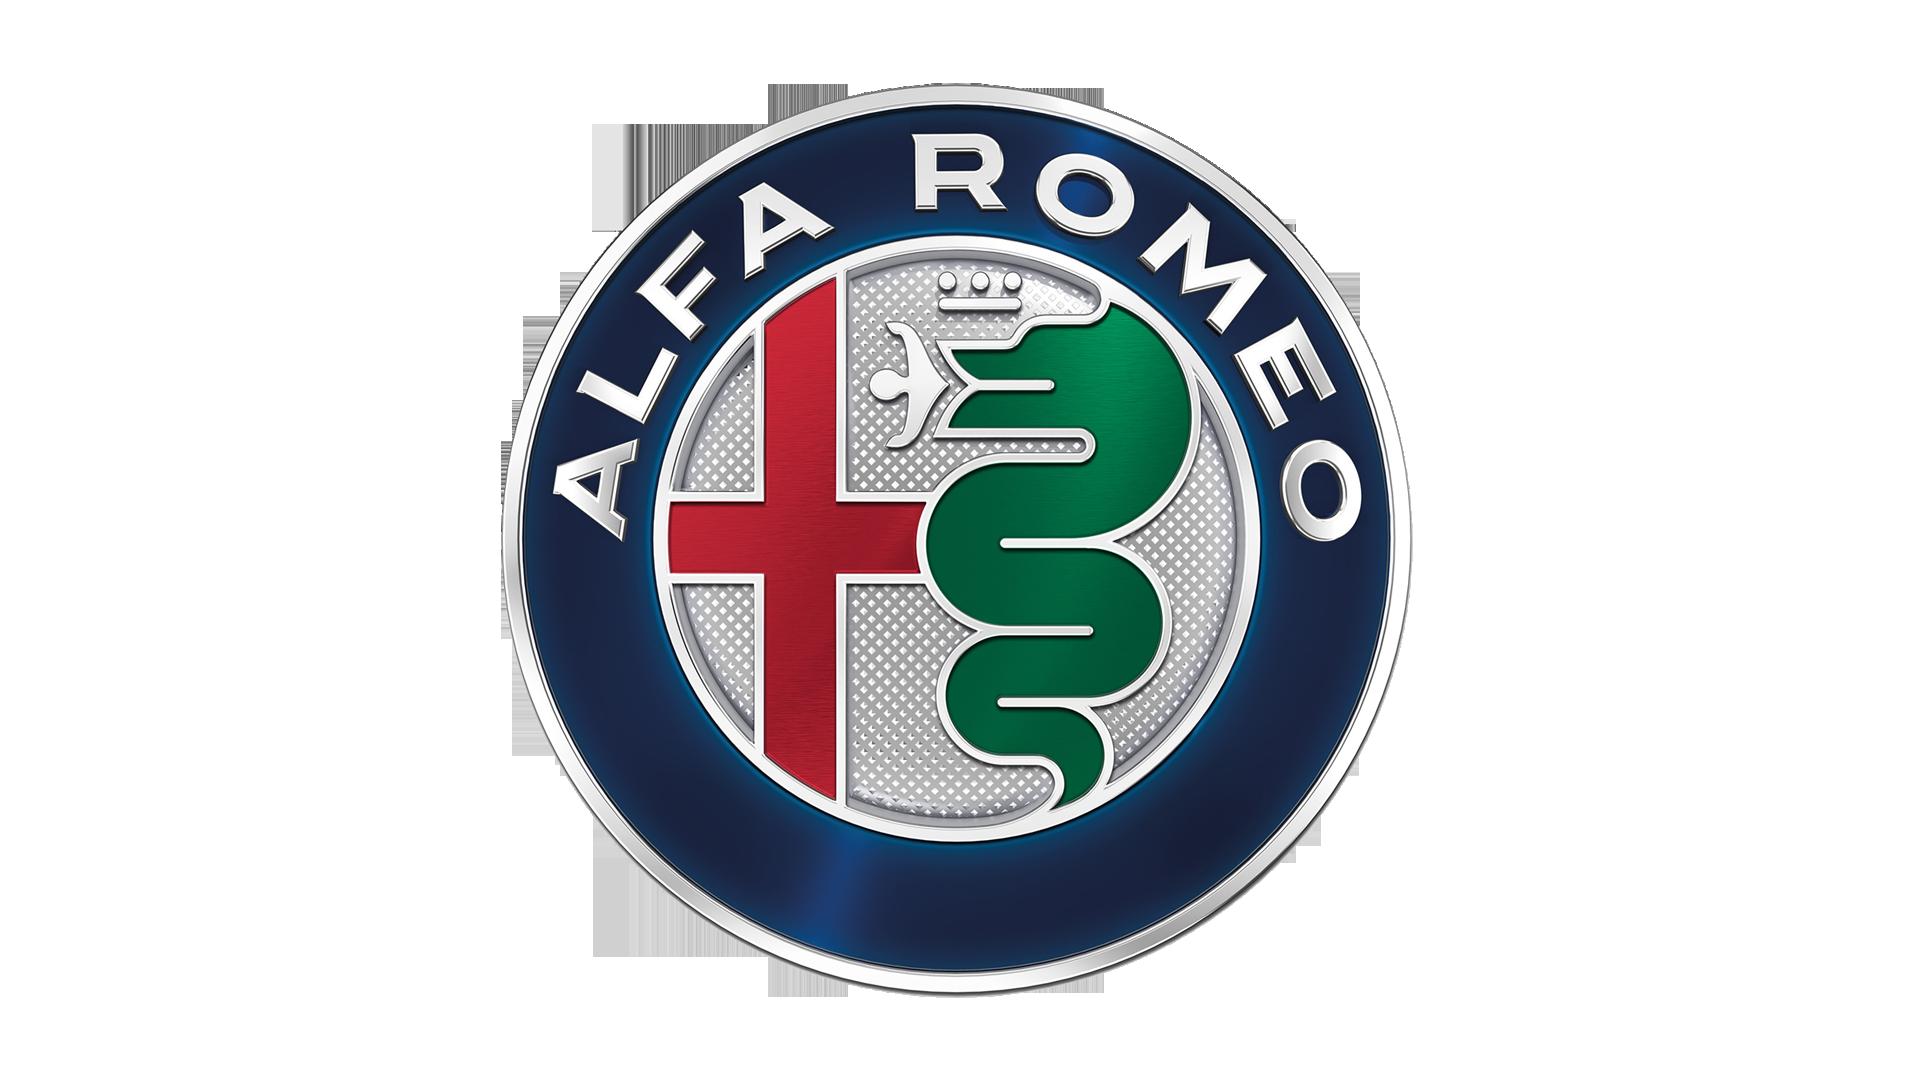 Alfa-Romeo-logo-2015-1920x1080